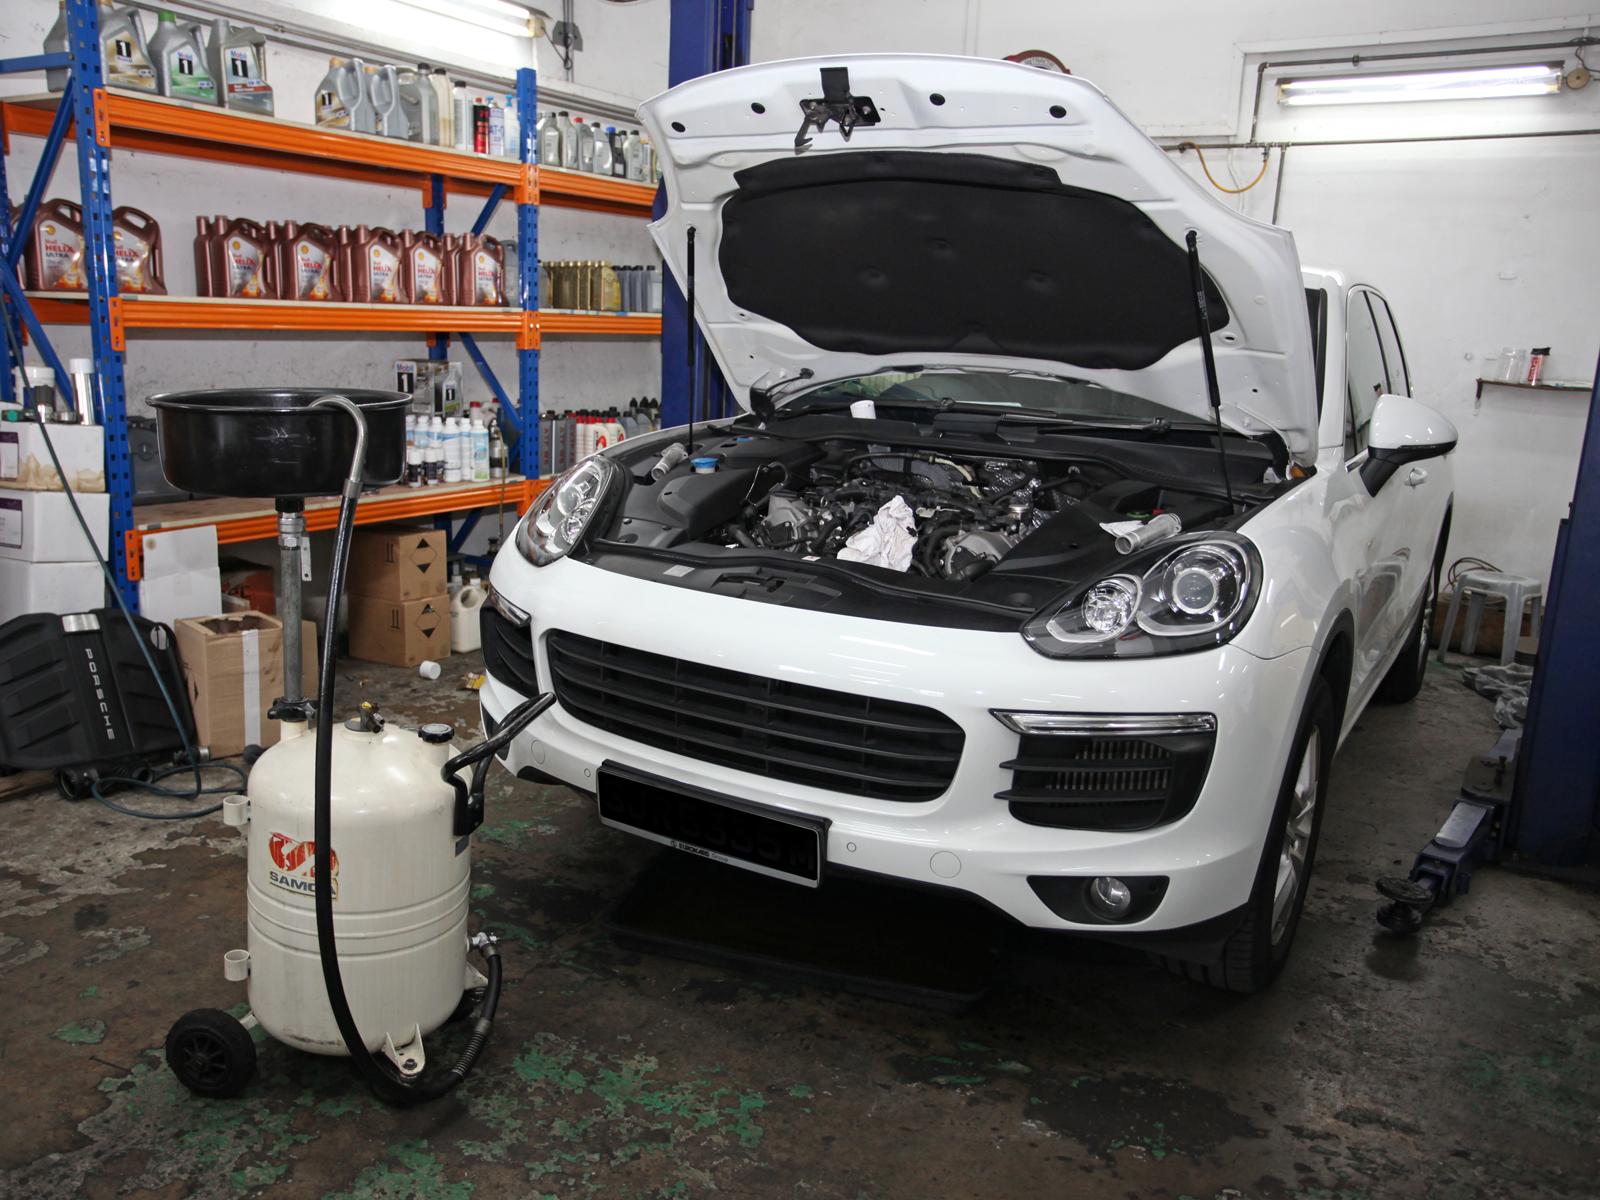 Shell Helix Ultra 5W40 Mercedes-Benz C180 / C200 / C250 Vehicle Servicing